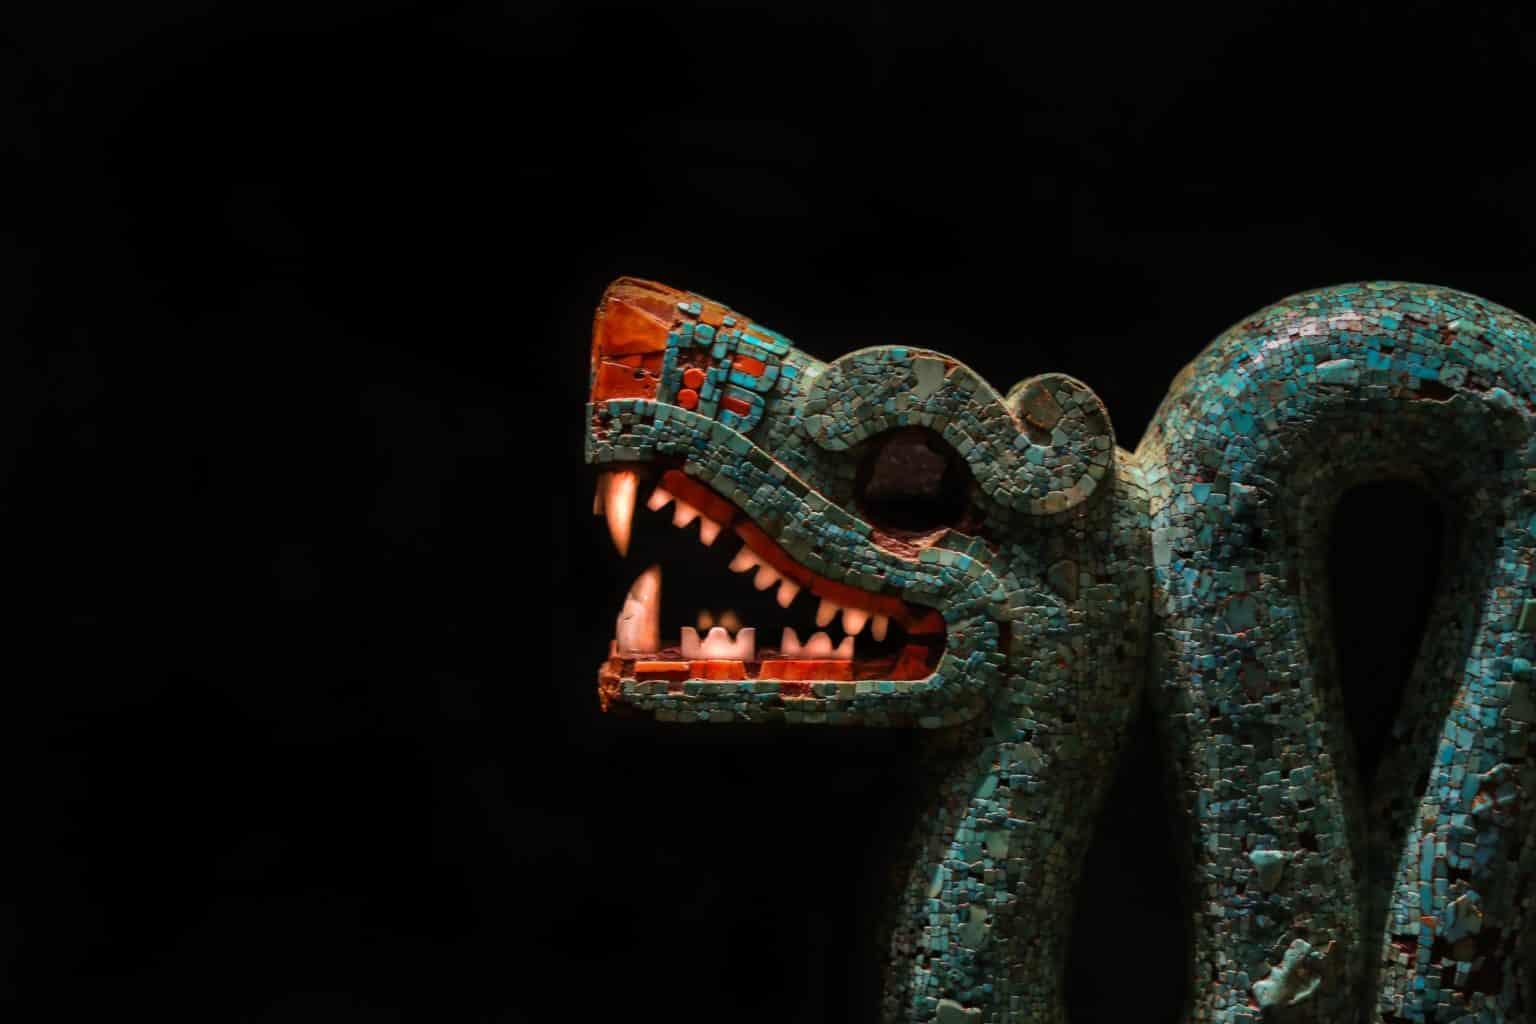 Sculpture d'un dieu aztèque